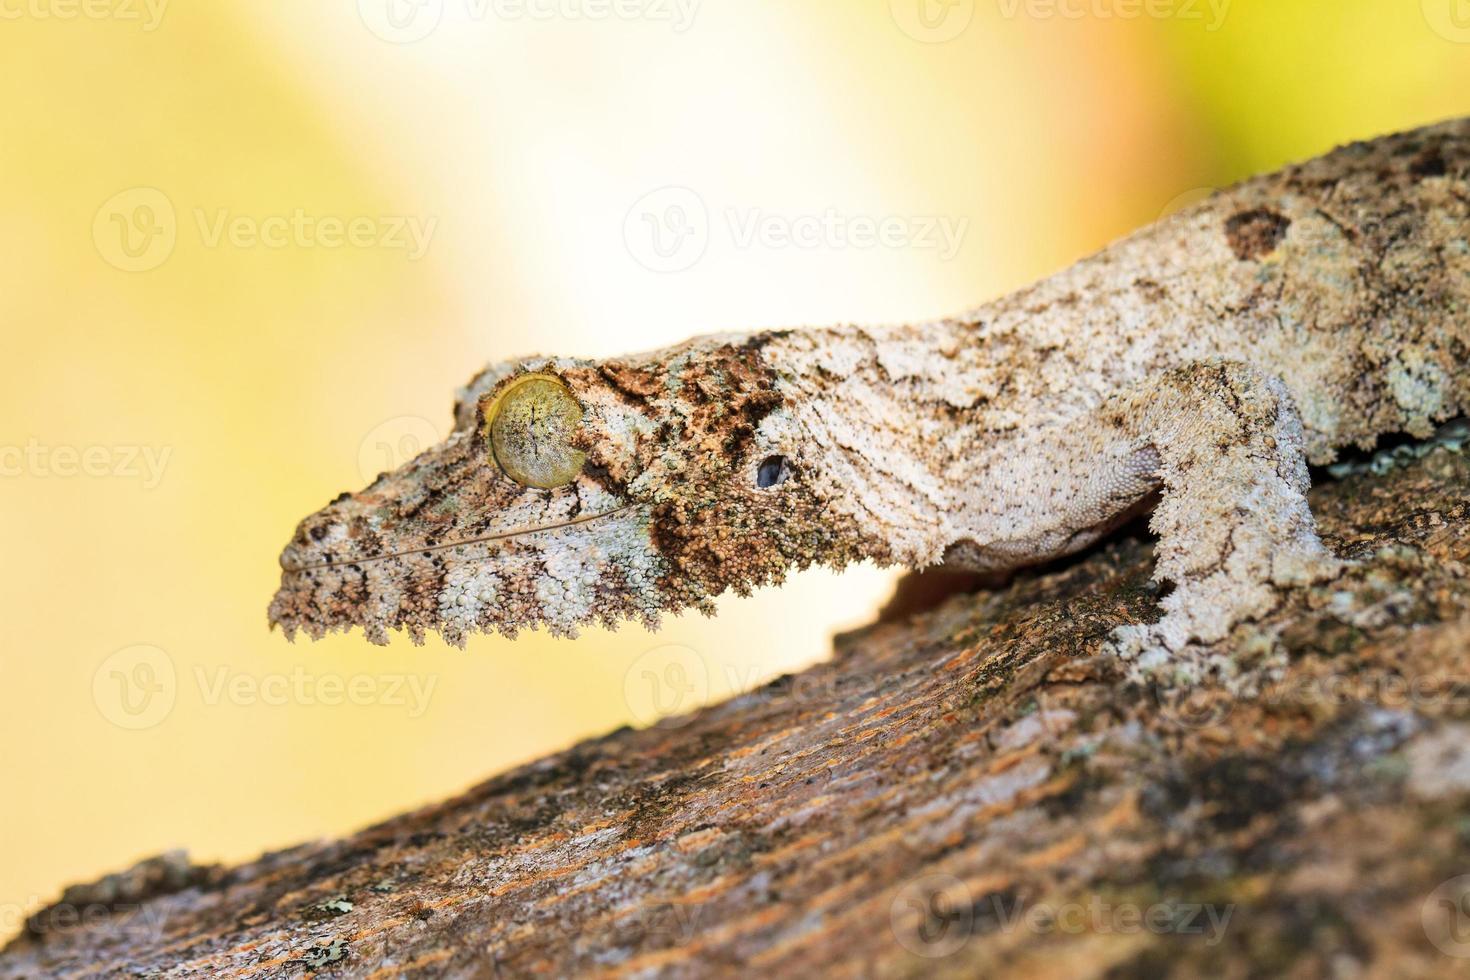 Leaf tailed gecko portrait photo